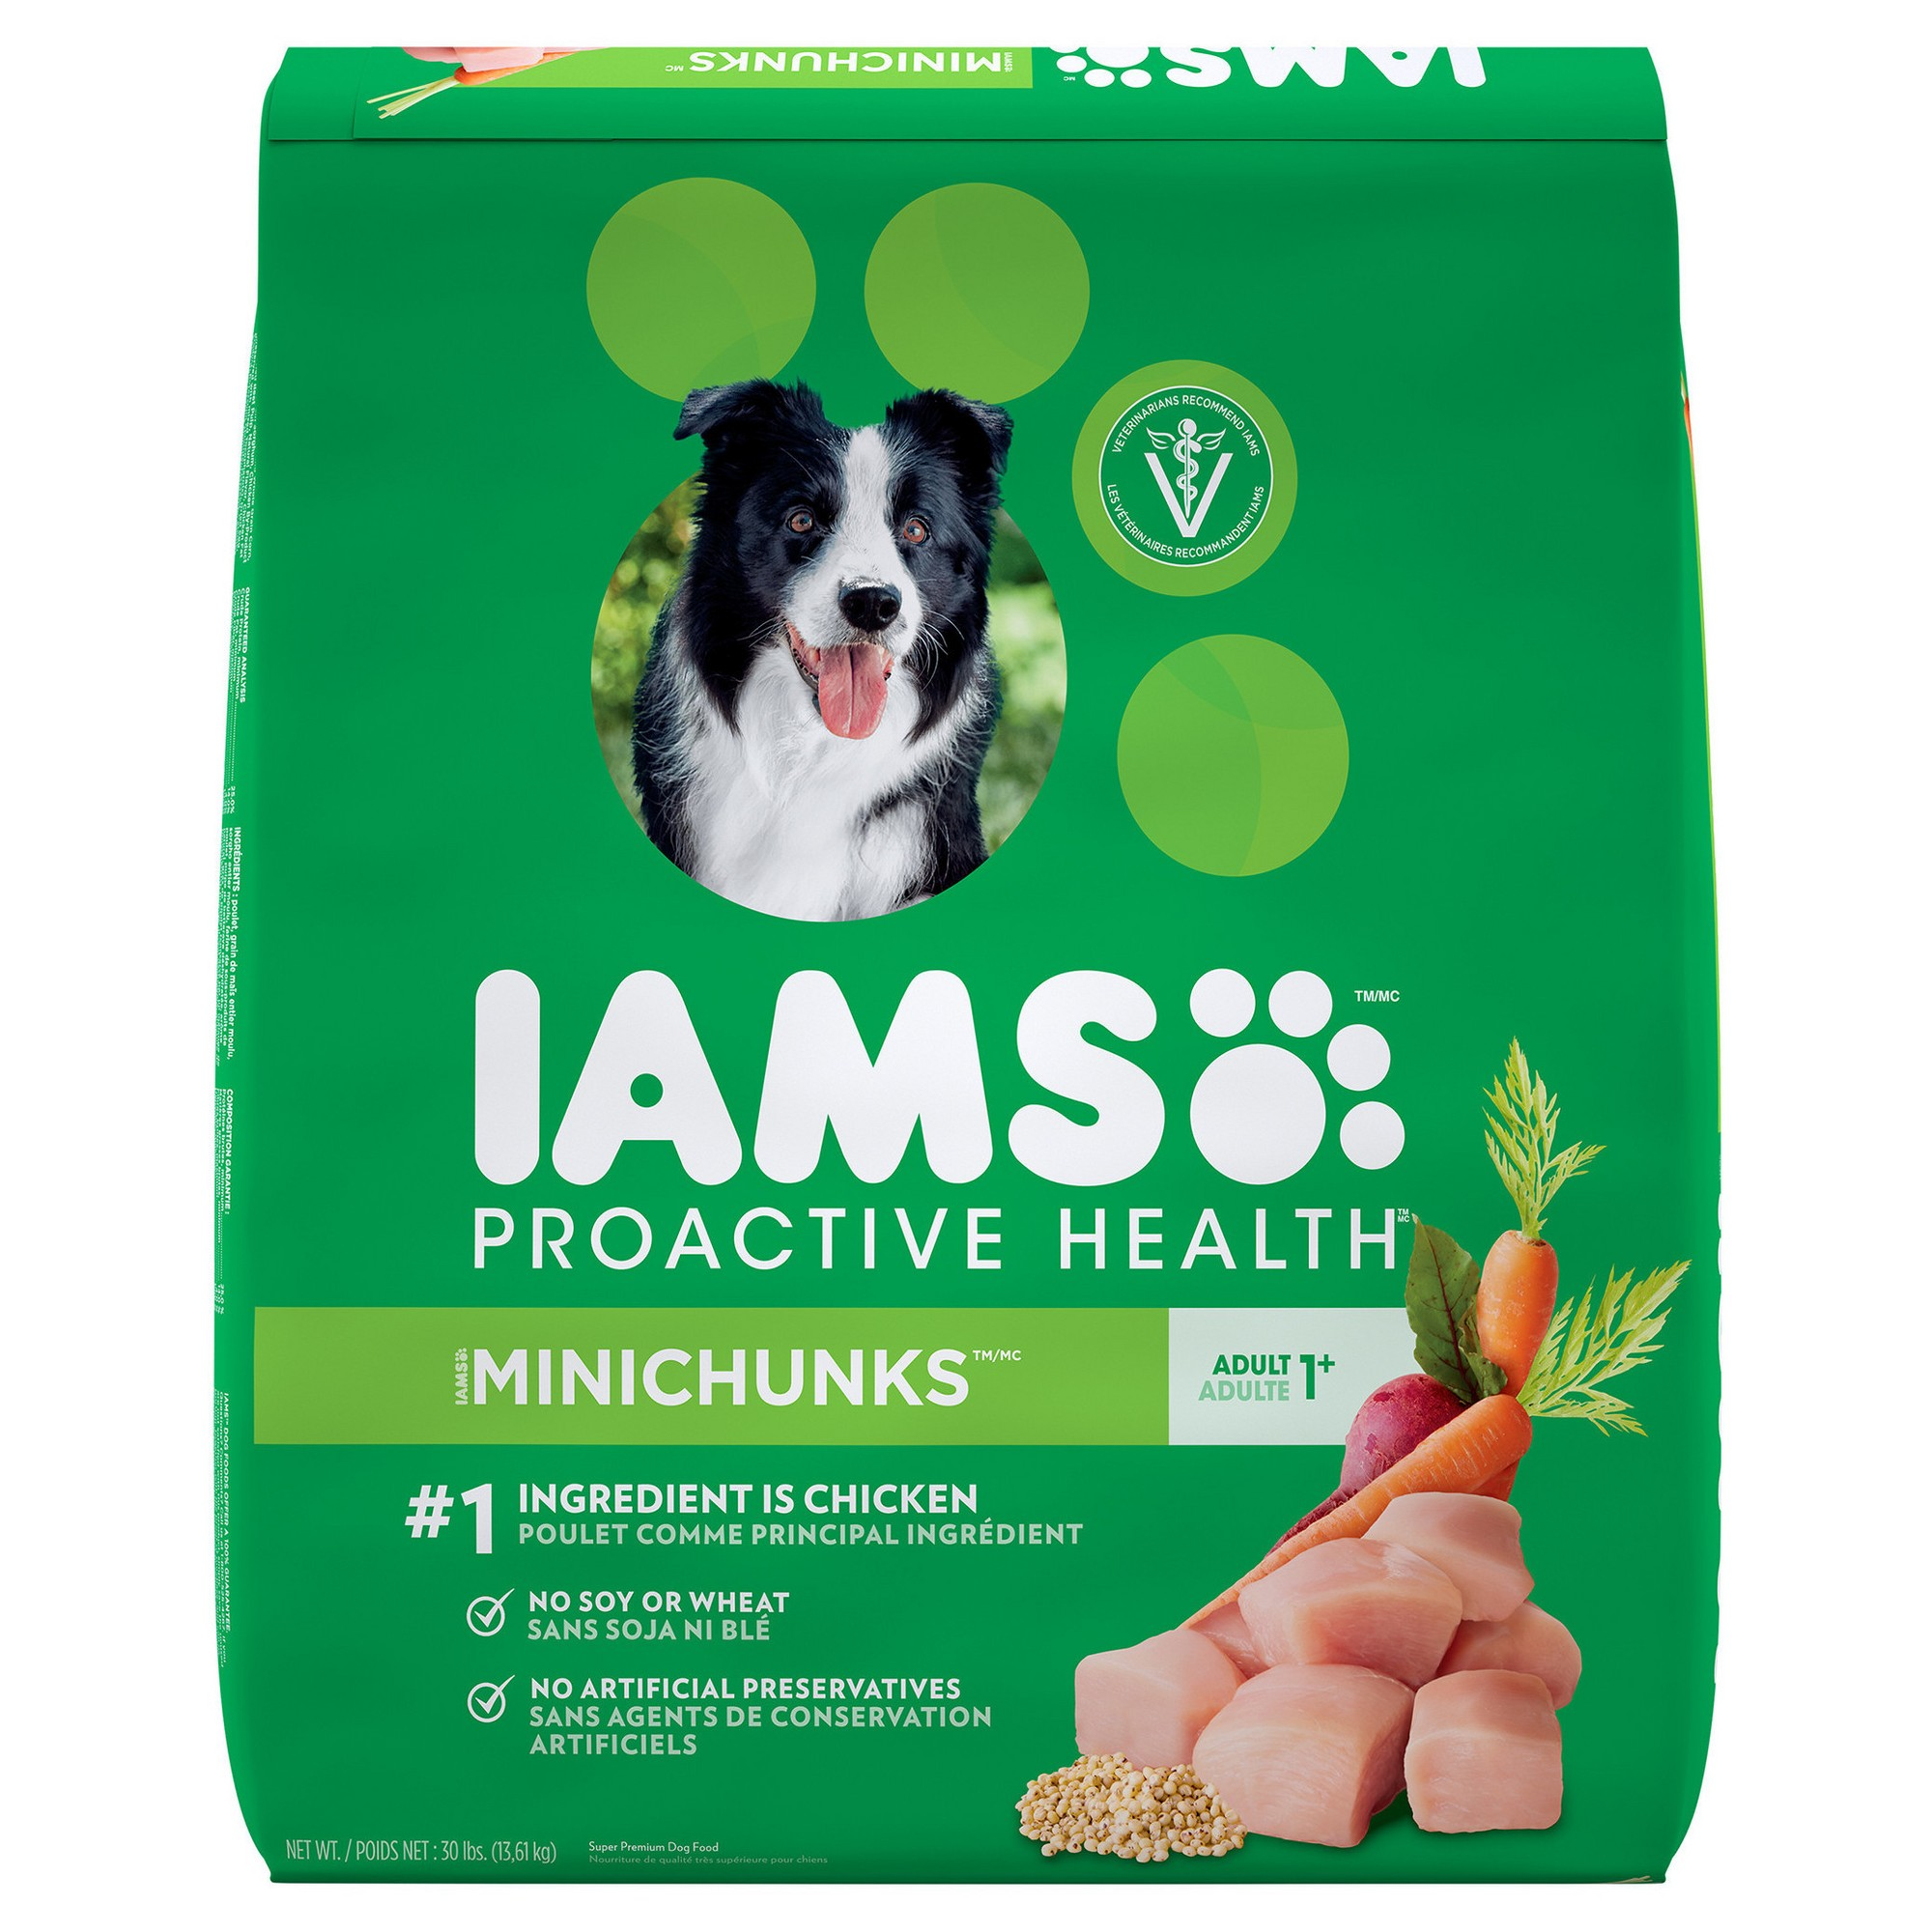 Iams Proactive Health Adult Minichunks Dry Dog Food 30lbs Adult